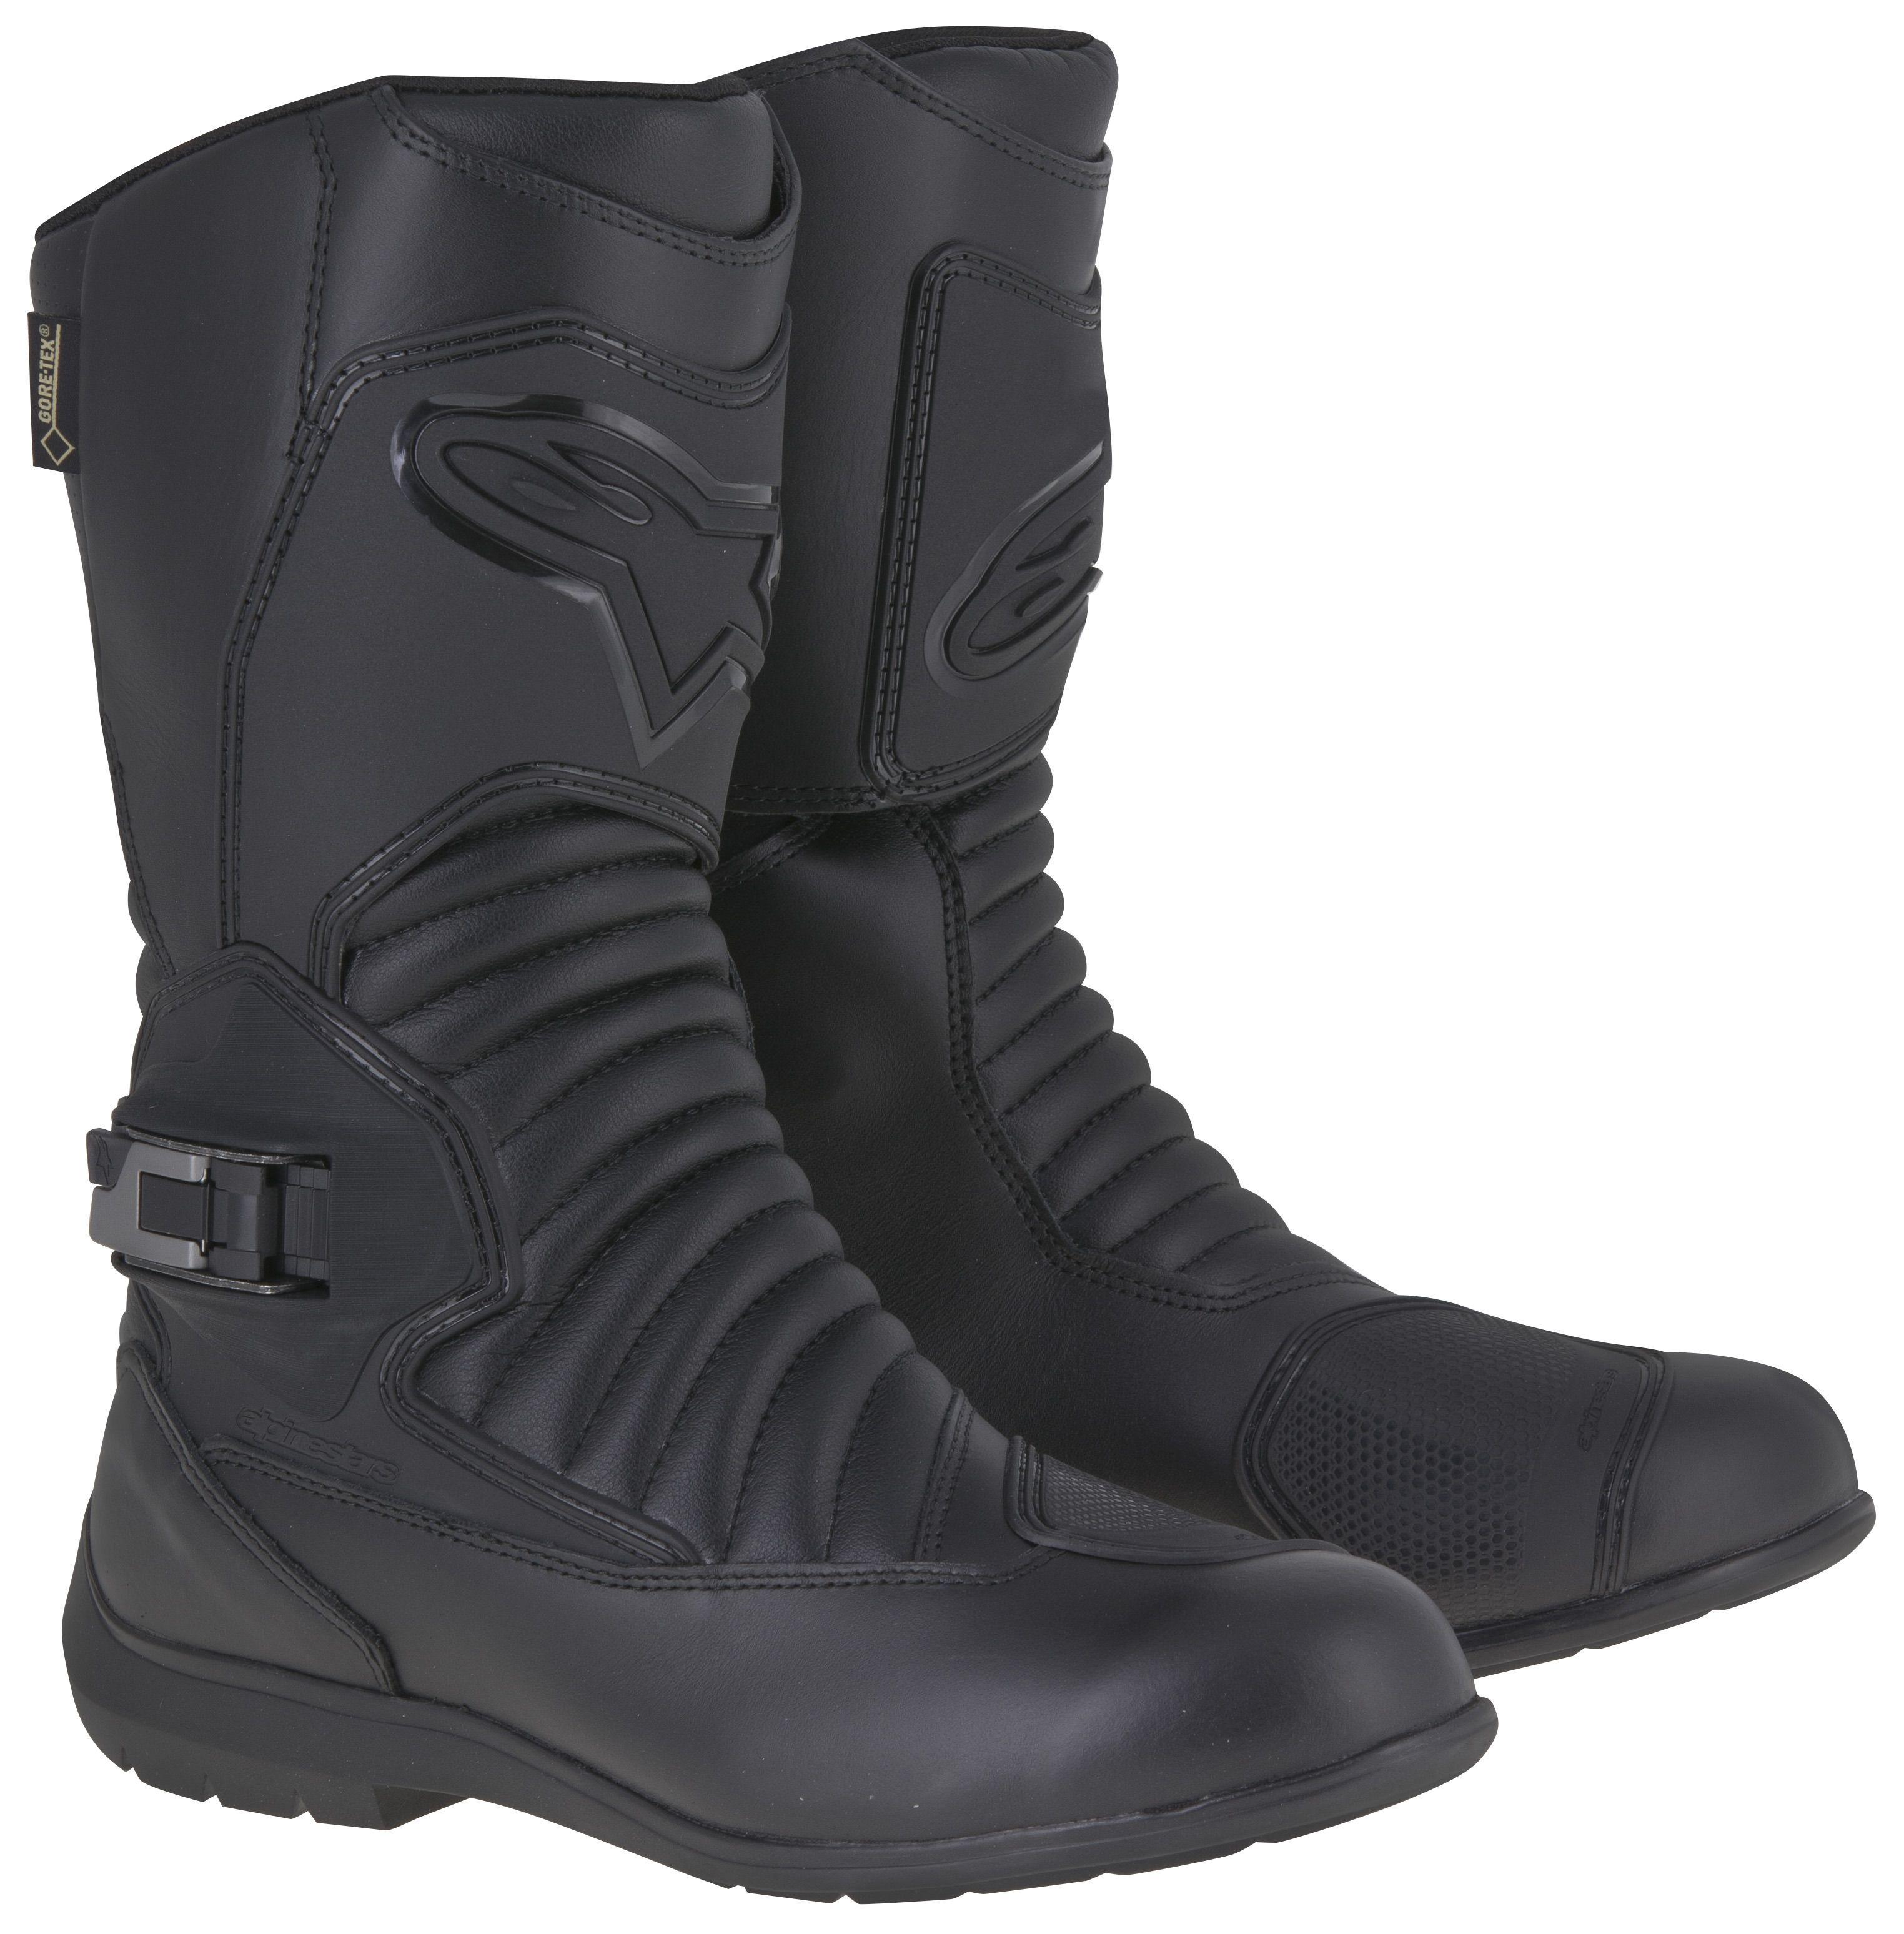 Alpinestars Supertouring Gore-Tex Boots - RevZilla